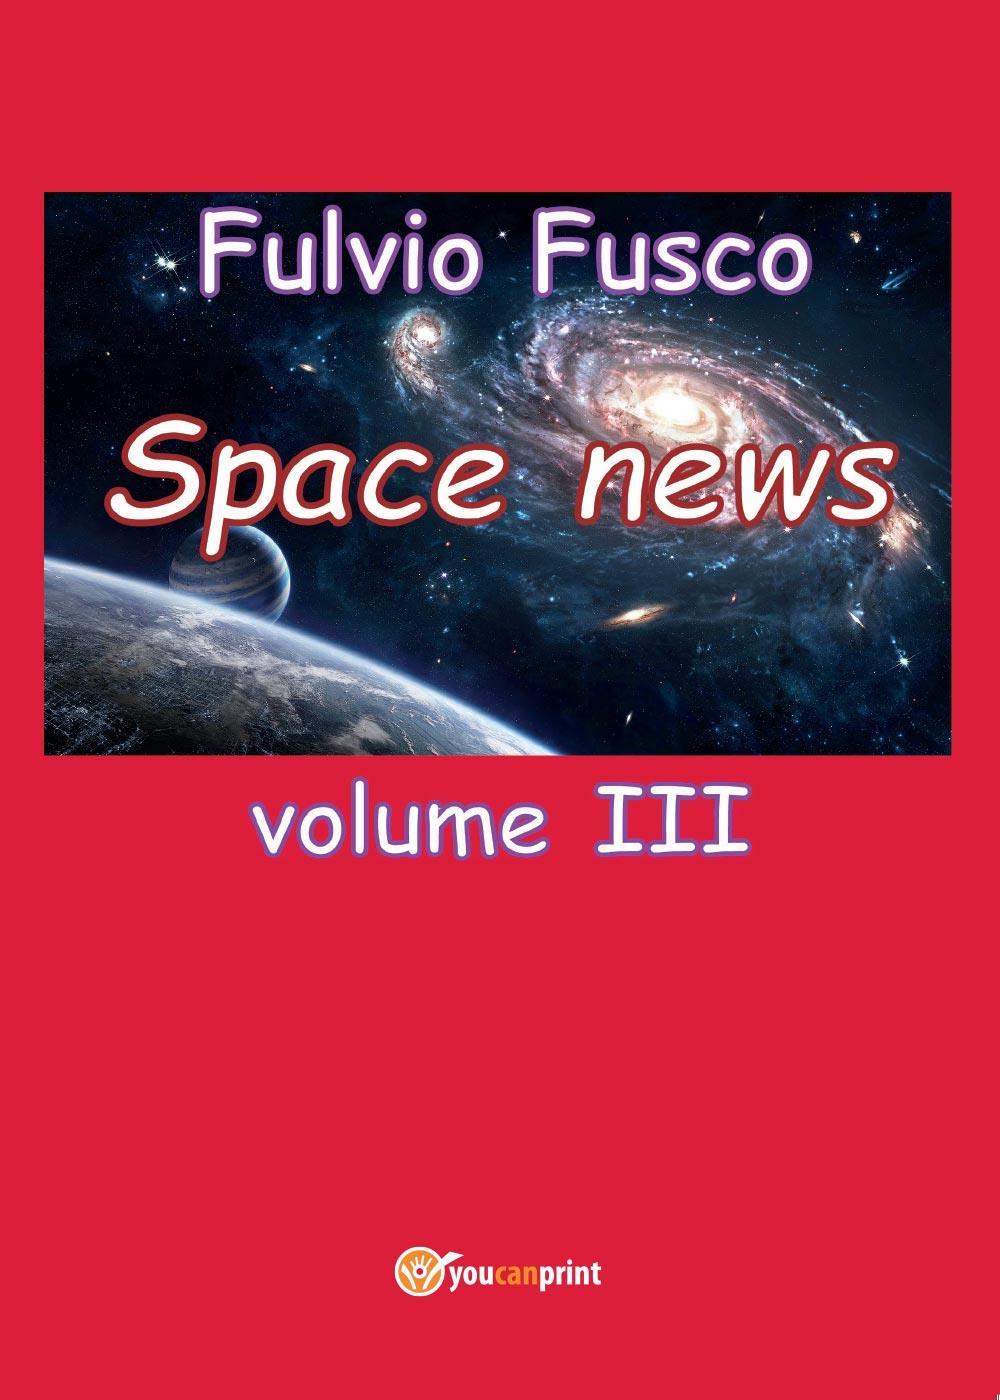 Space news. Vol. III